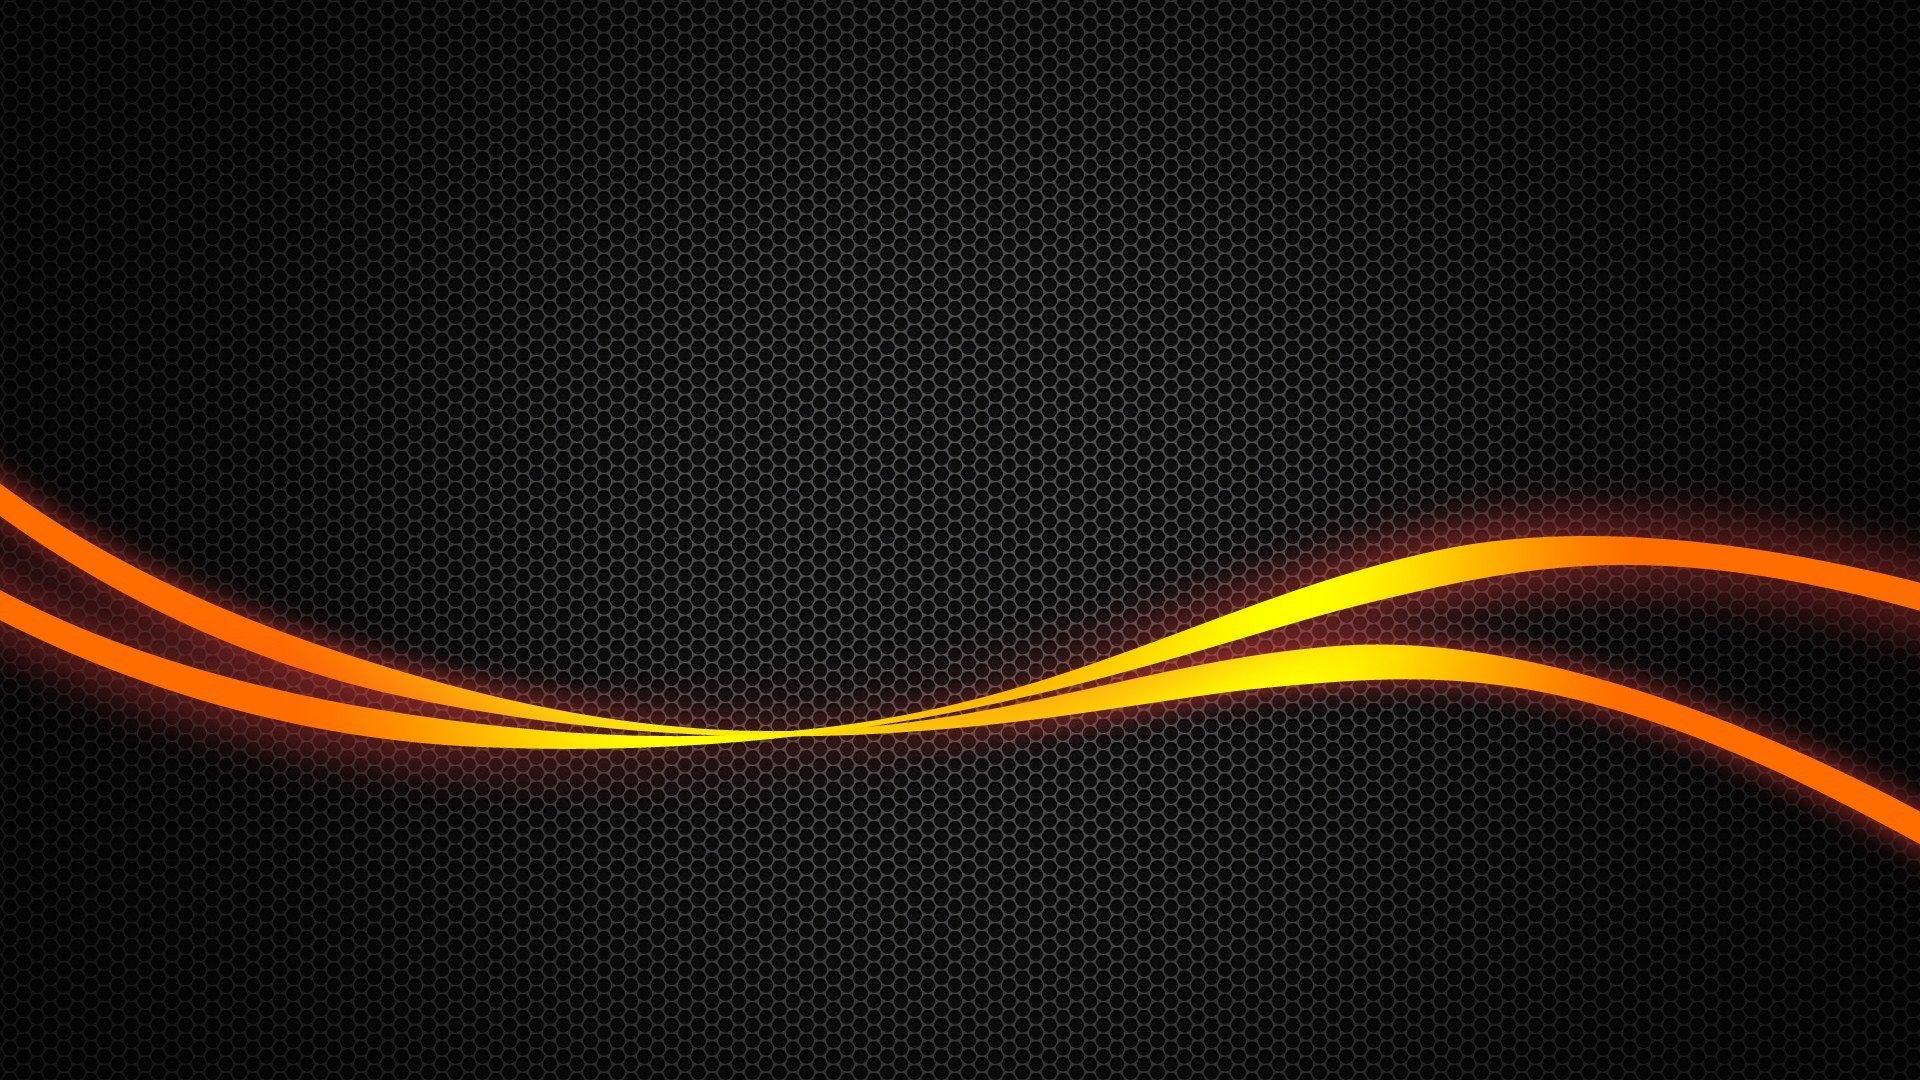 The Legend Of Zelda Wallpaper Hd High Resolution Orange Abstract Hd 1080p Background Id